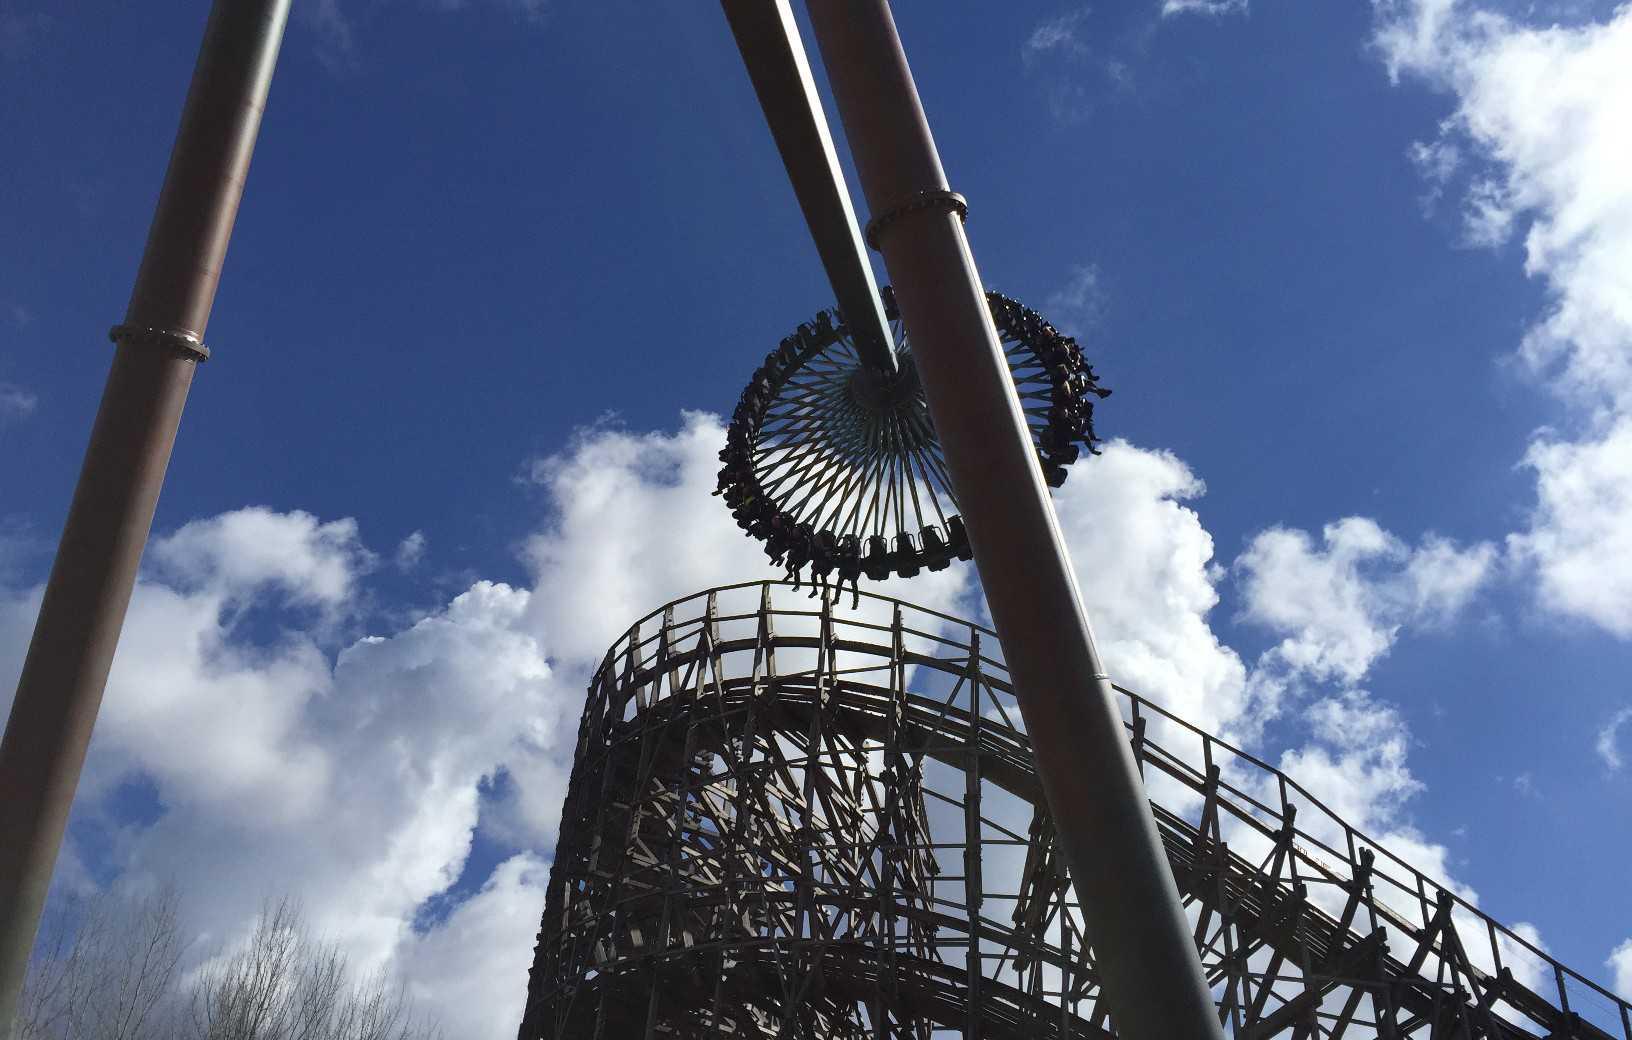 Intamin gyro swing coaster Liseberg